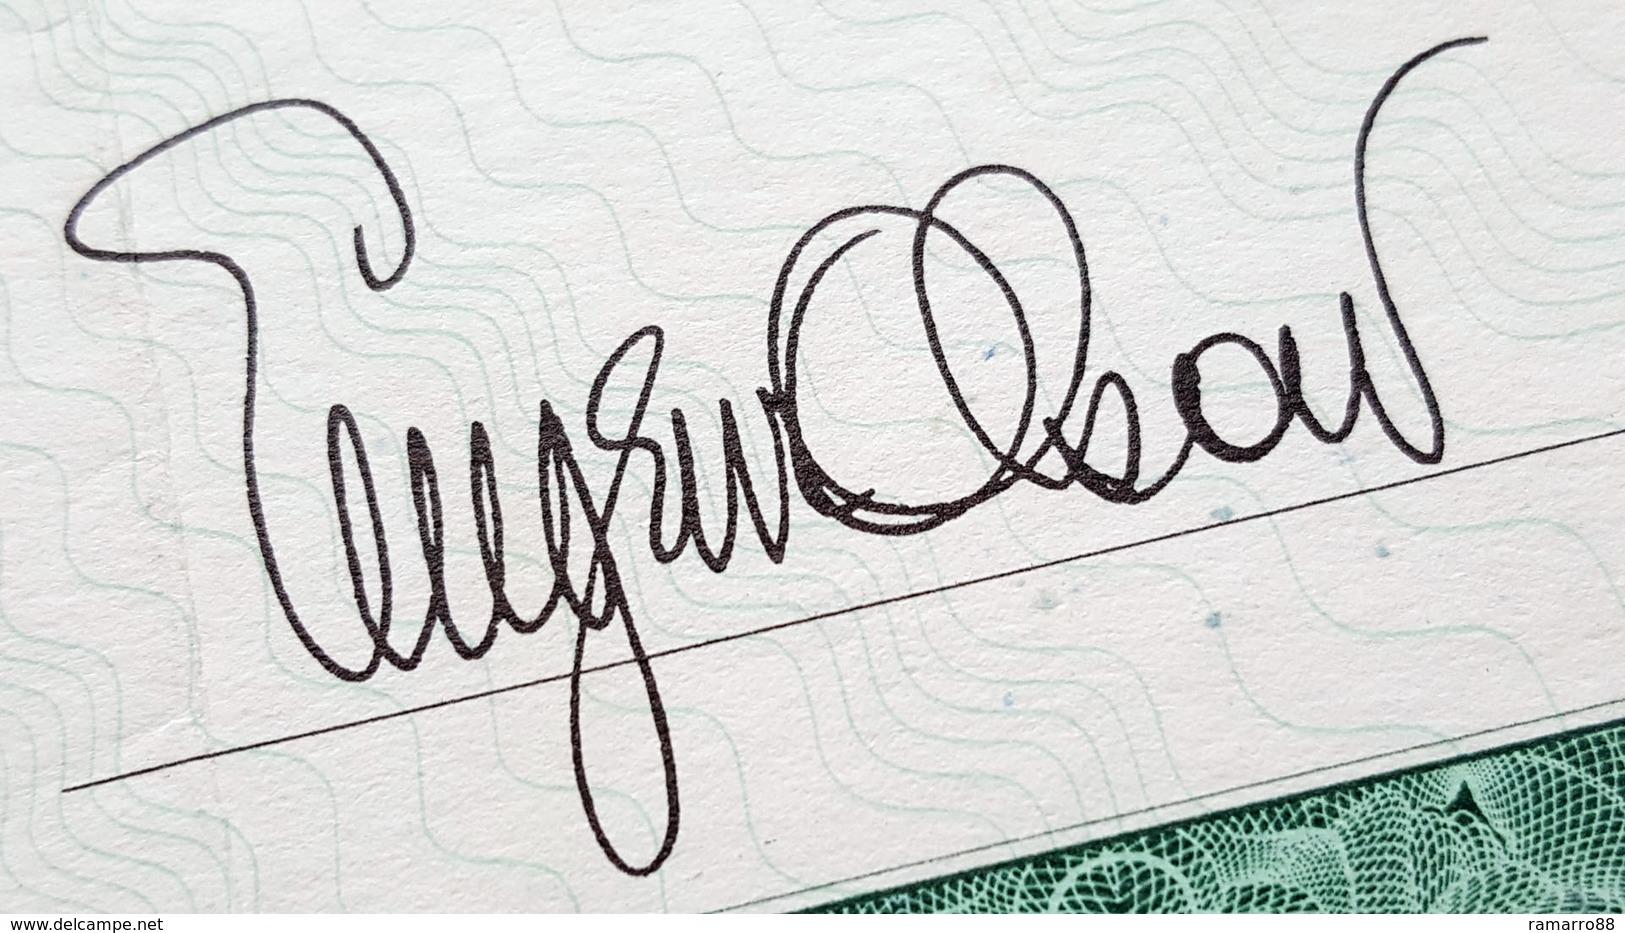 USA - Eugene Olson Banknote Engraver - Rare Bond-like Specimen Promotional Note 1962 VF+ - Specimen